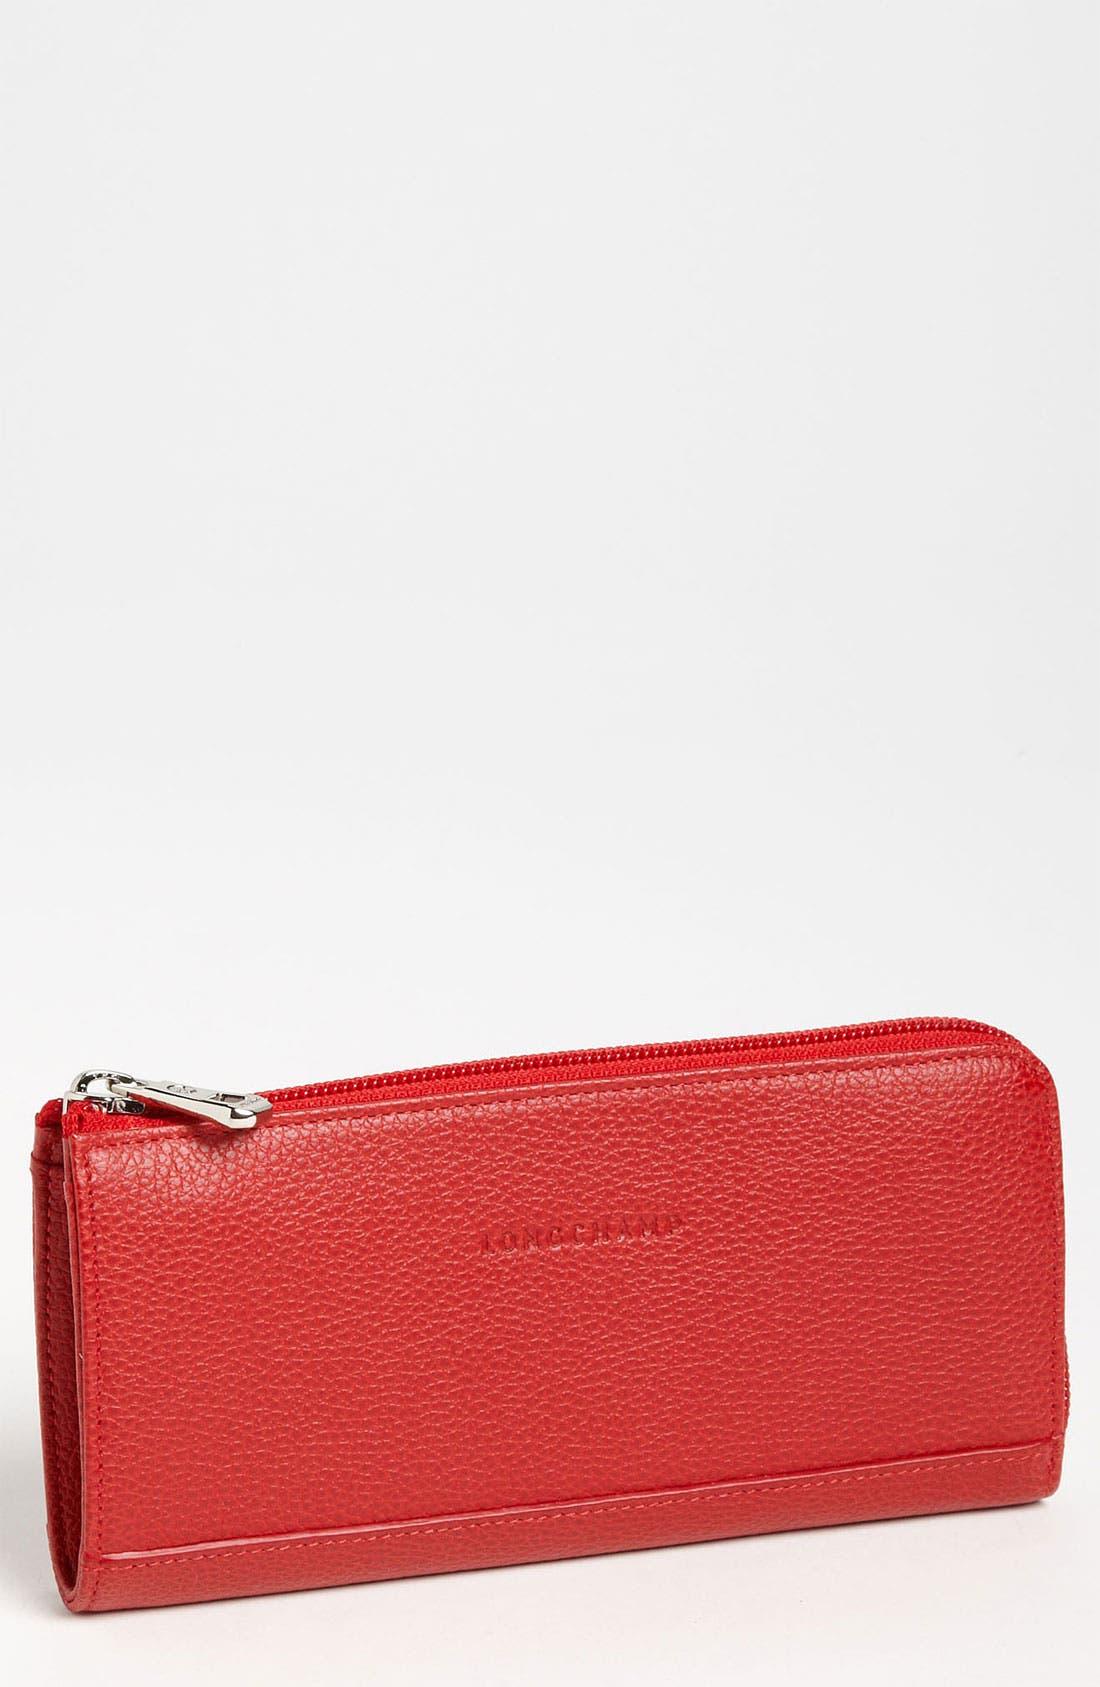 Main Image - Longchamp Leather Wallet